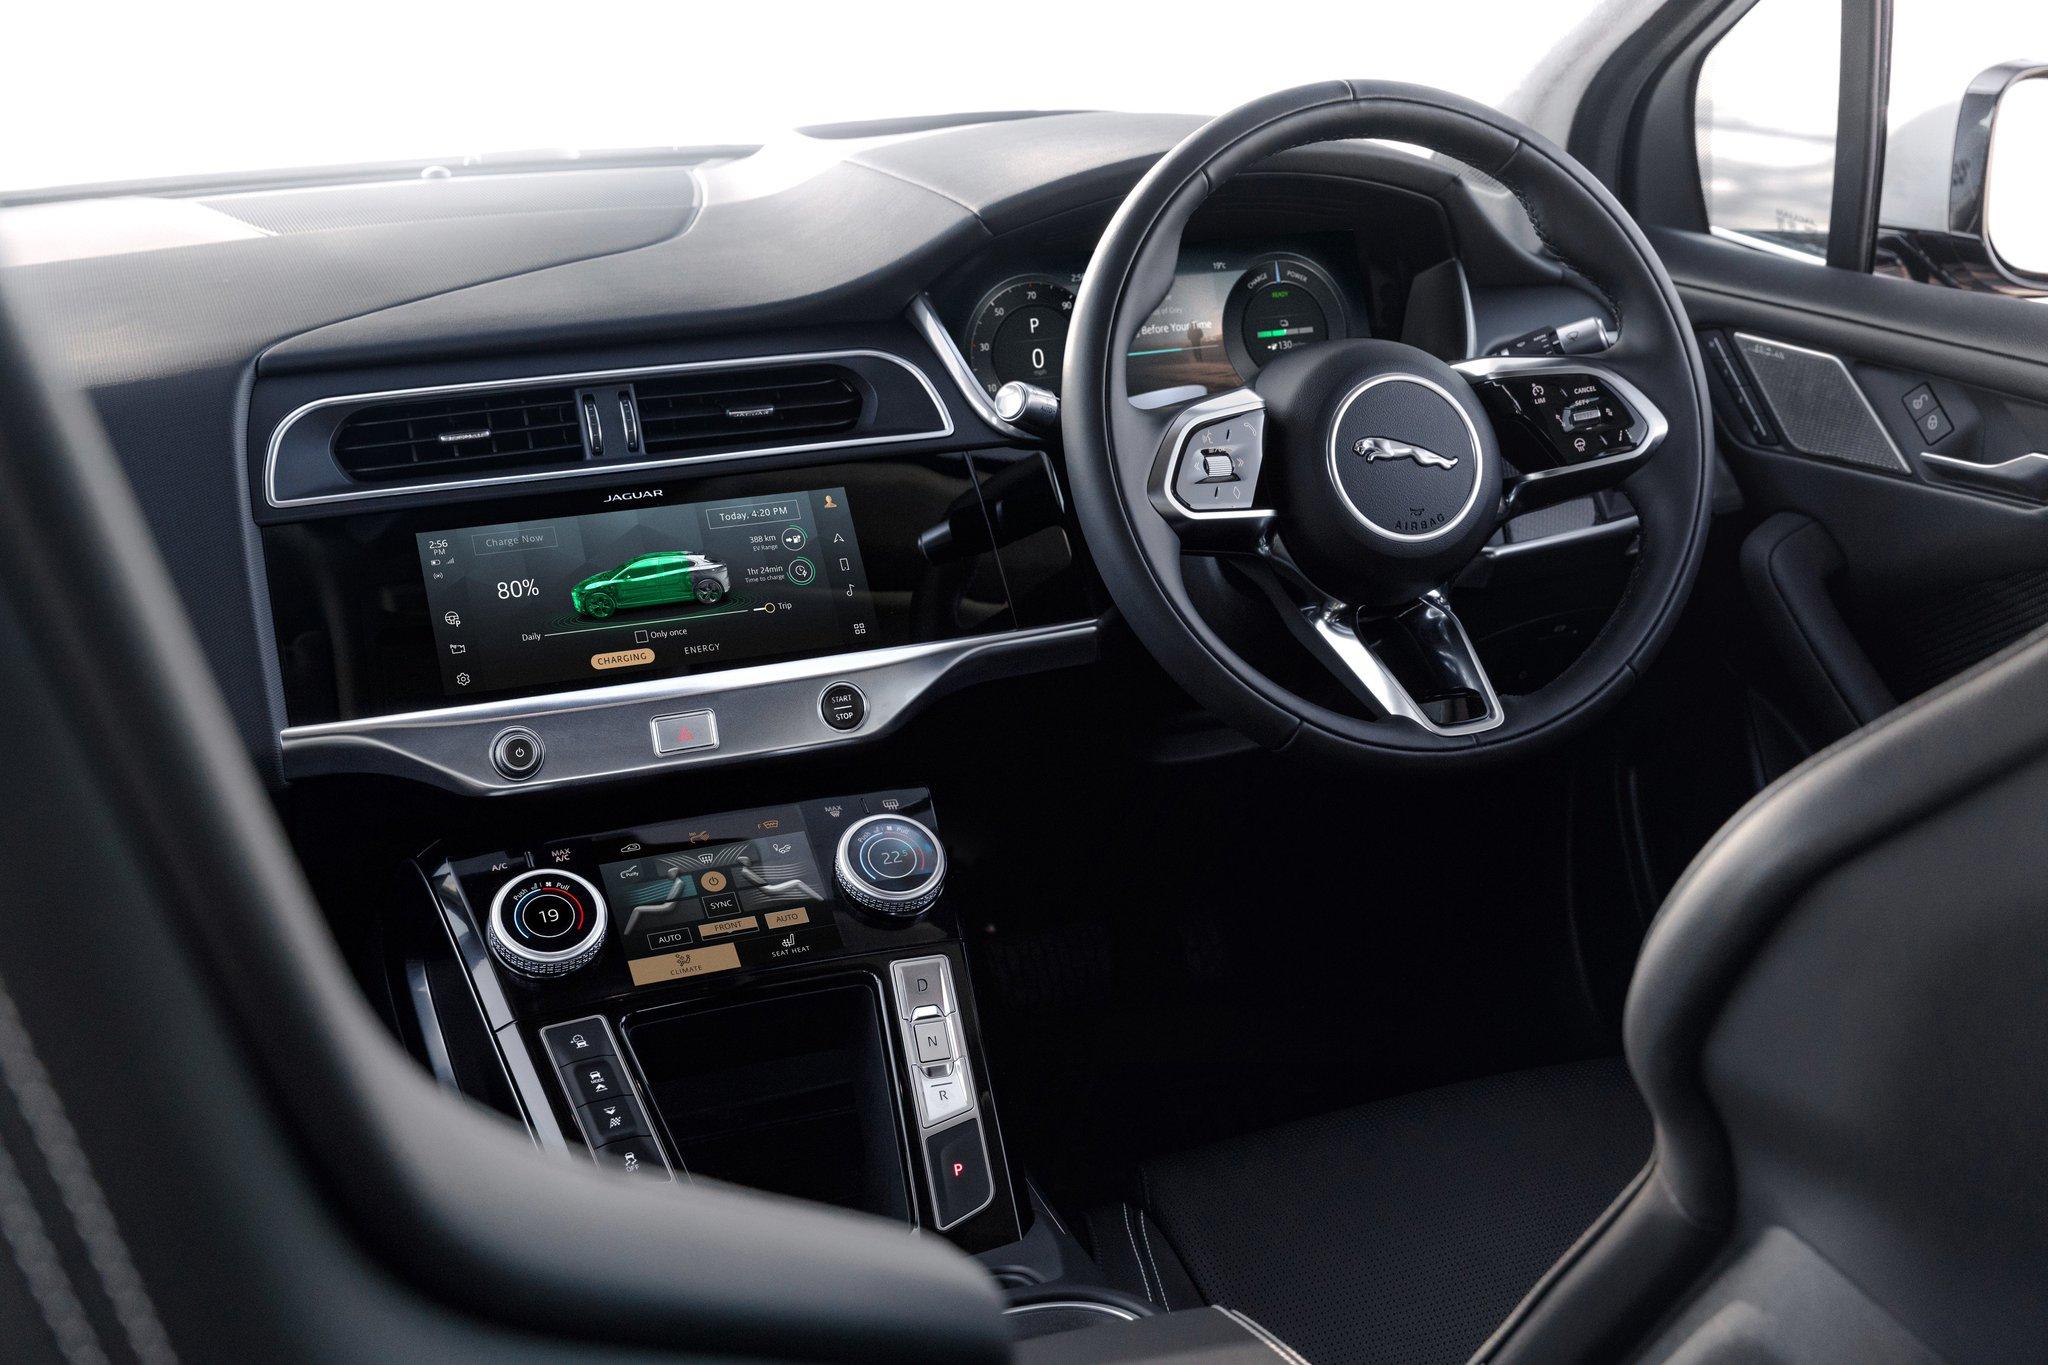 Jaguar I-PACE Interior Image Supplied by Jaguar Land Rover South Africa